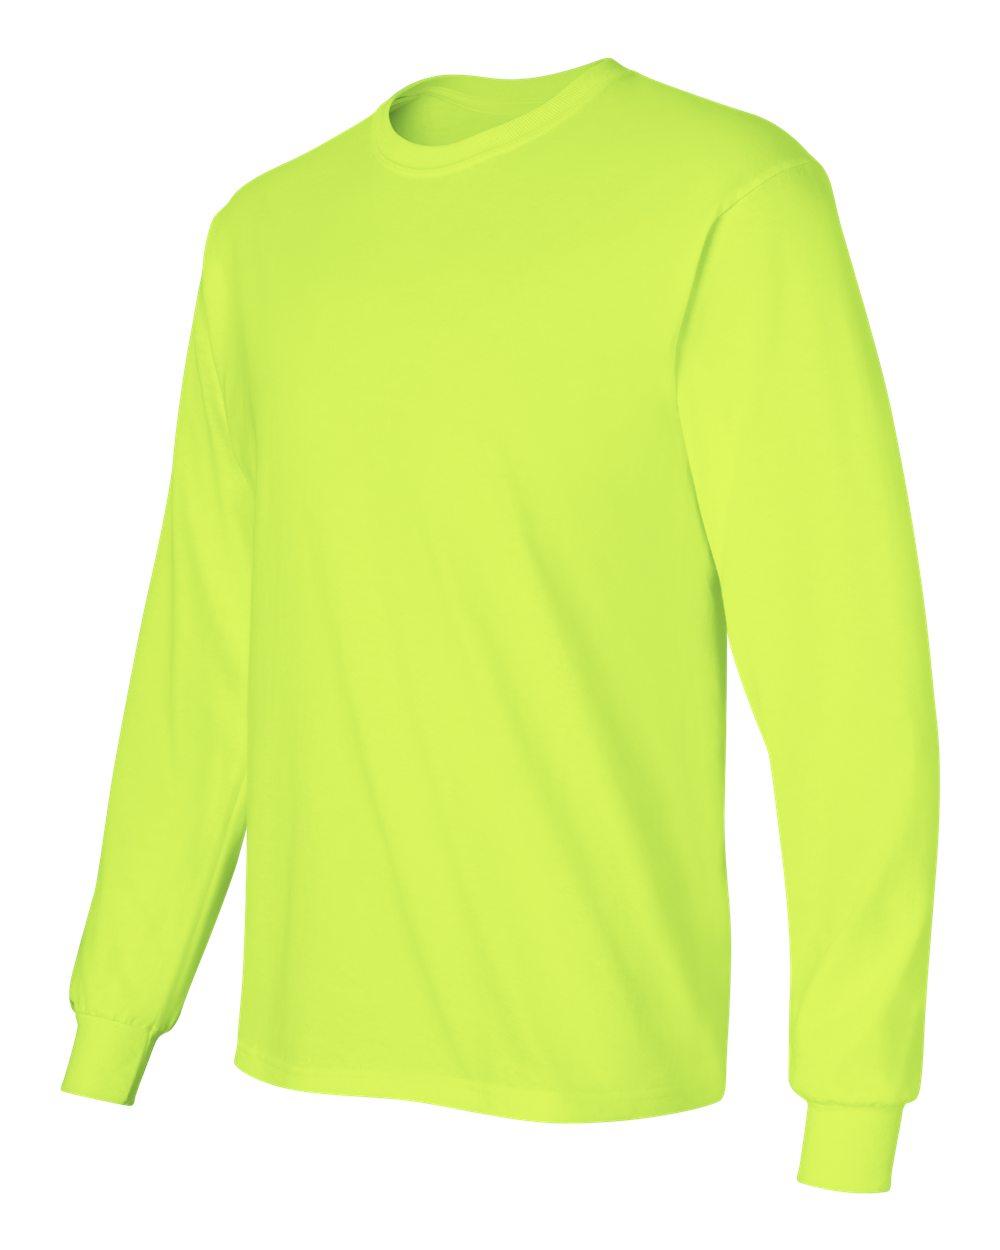 Gildan-Men-039-s-Ultra-Cotton-6-oz-Long-Sleeve-T-Shirt-G240-S-5XL thumbnail 88